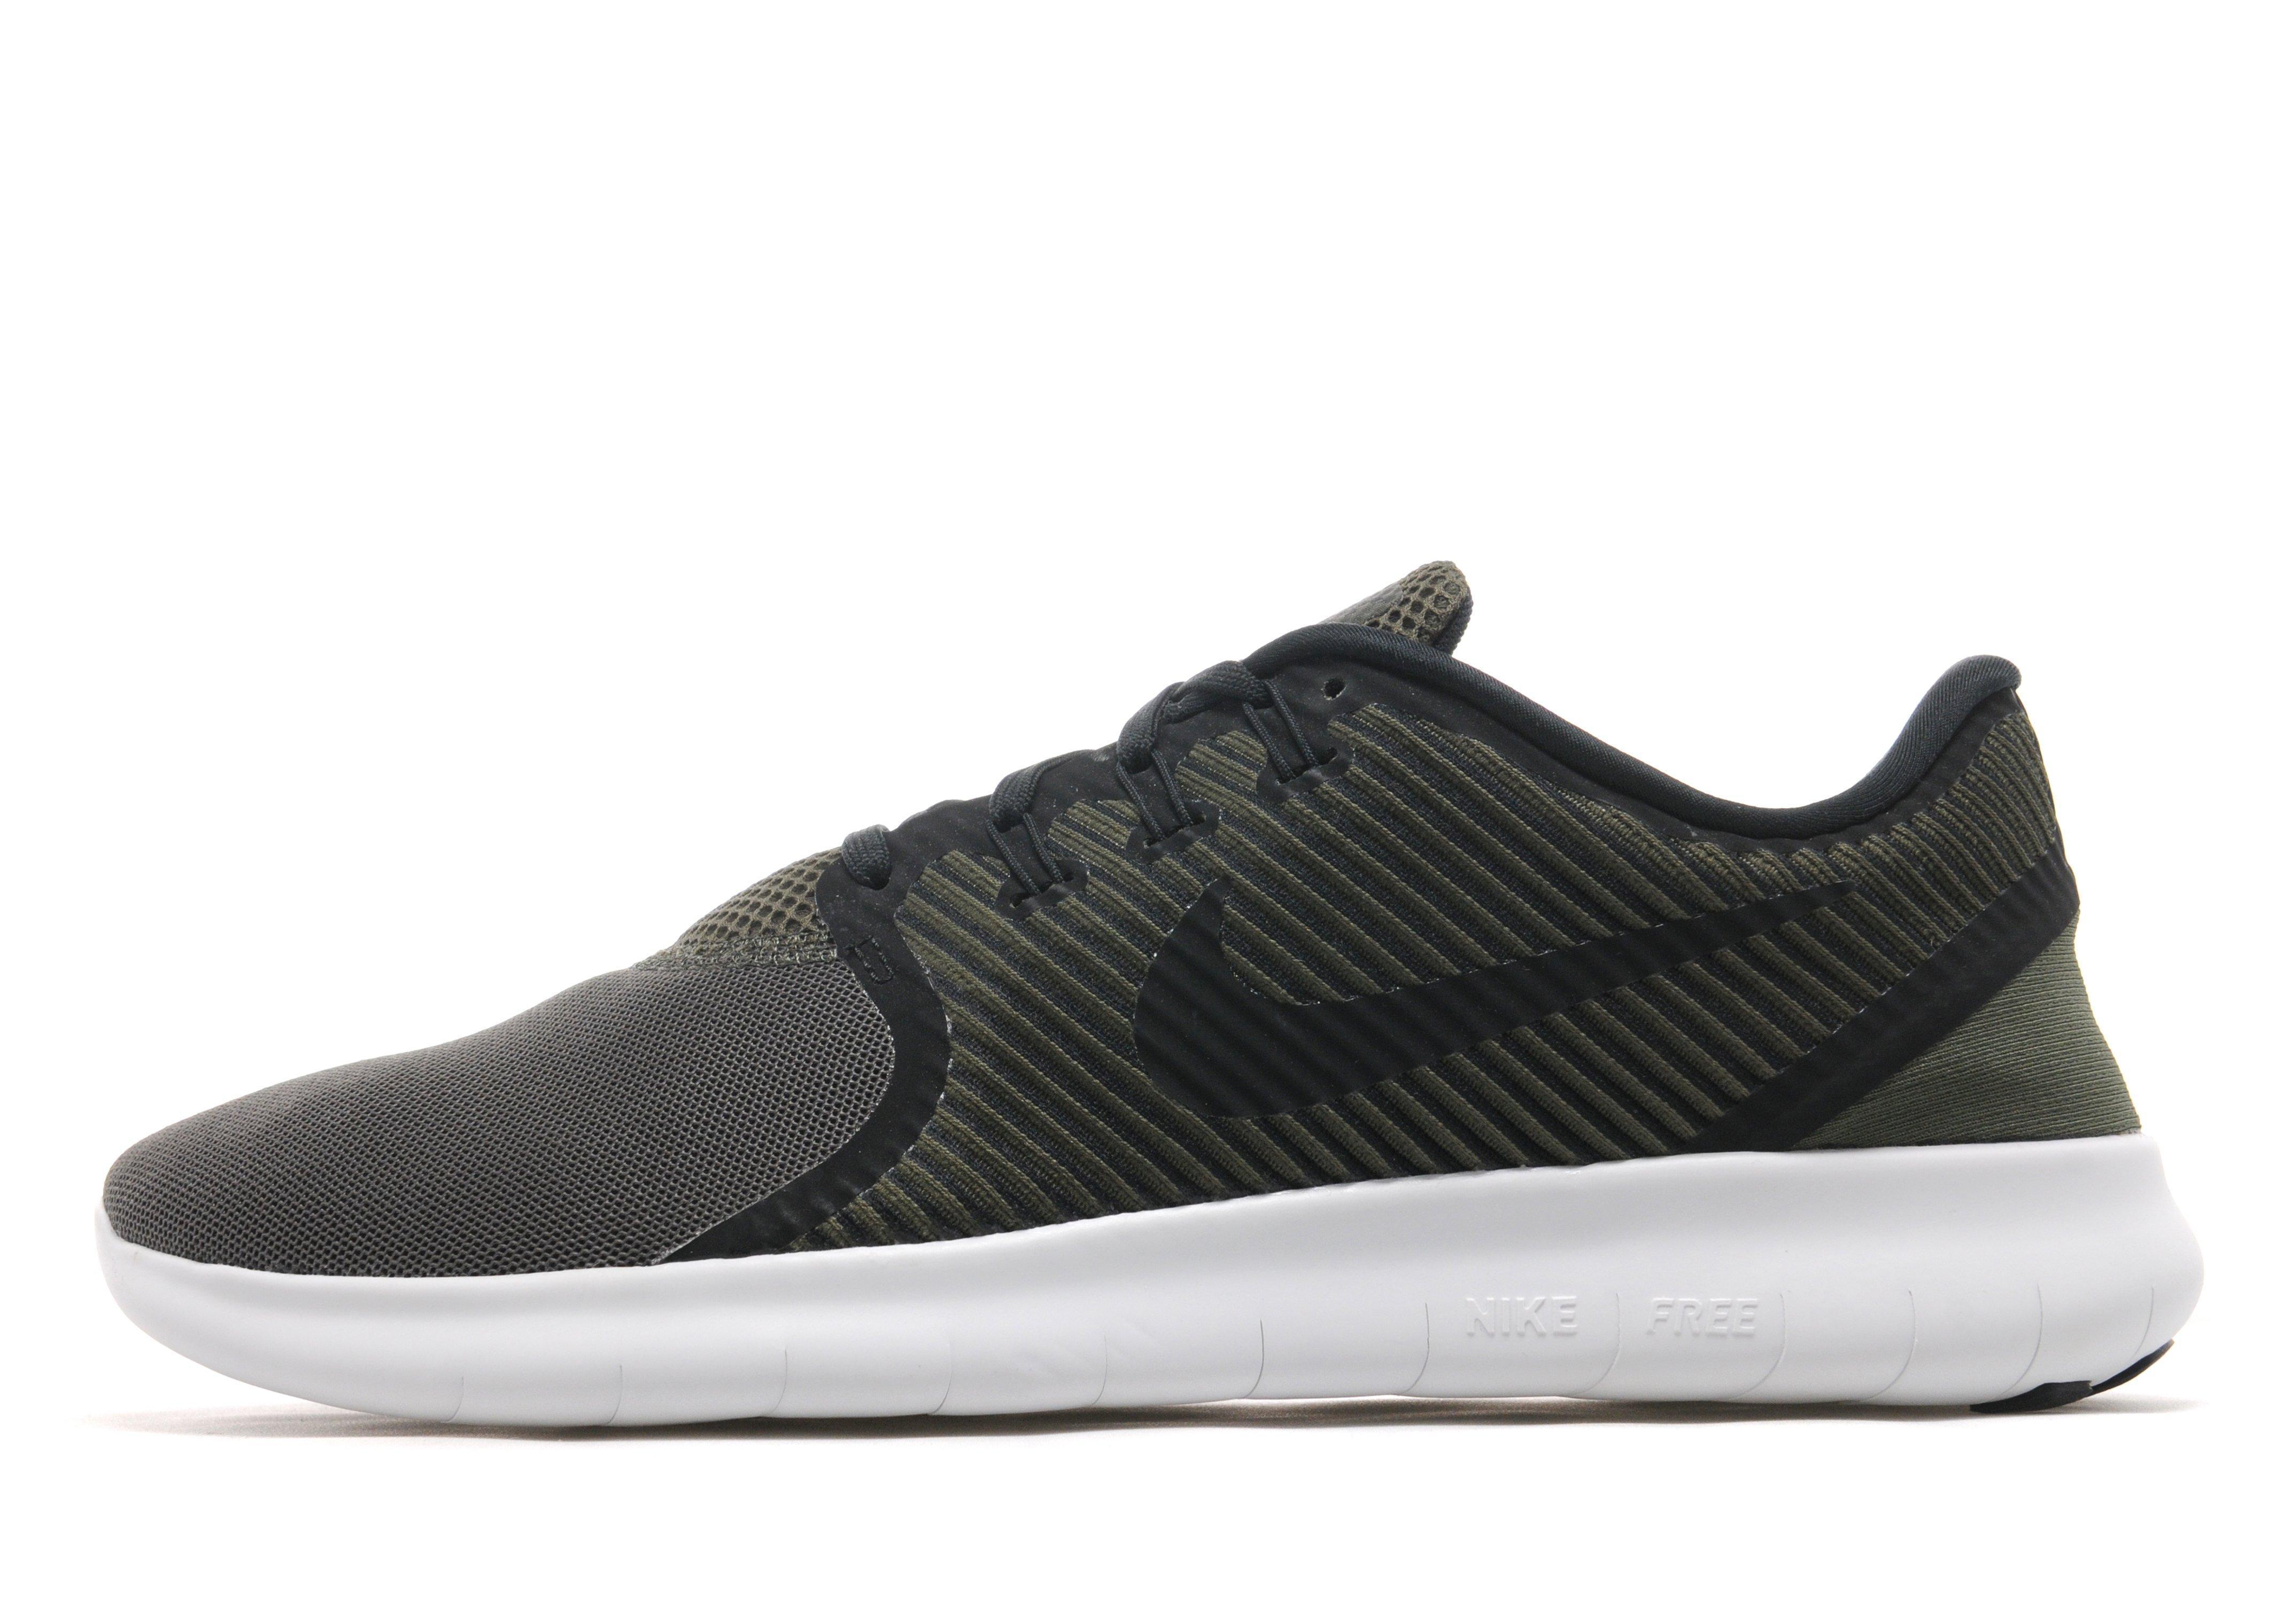 32cd9938a44 Lyst - Nike Free Run Commuter in Black for Men